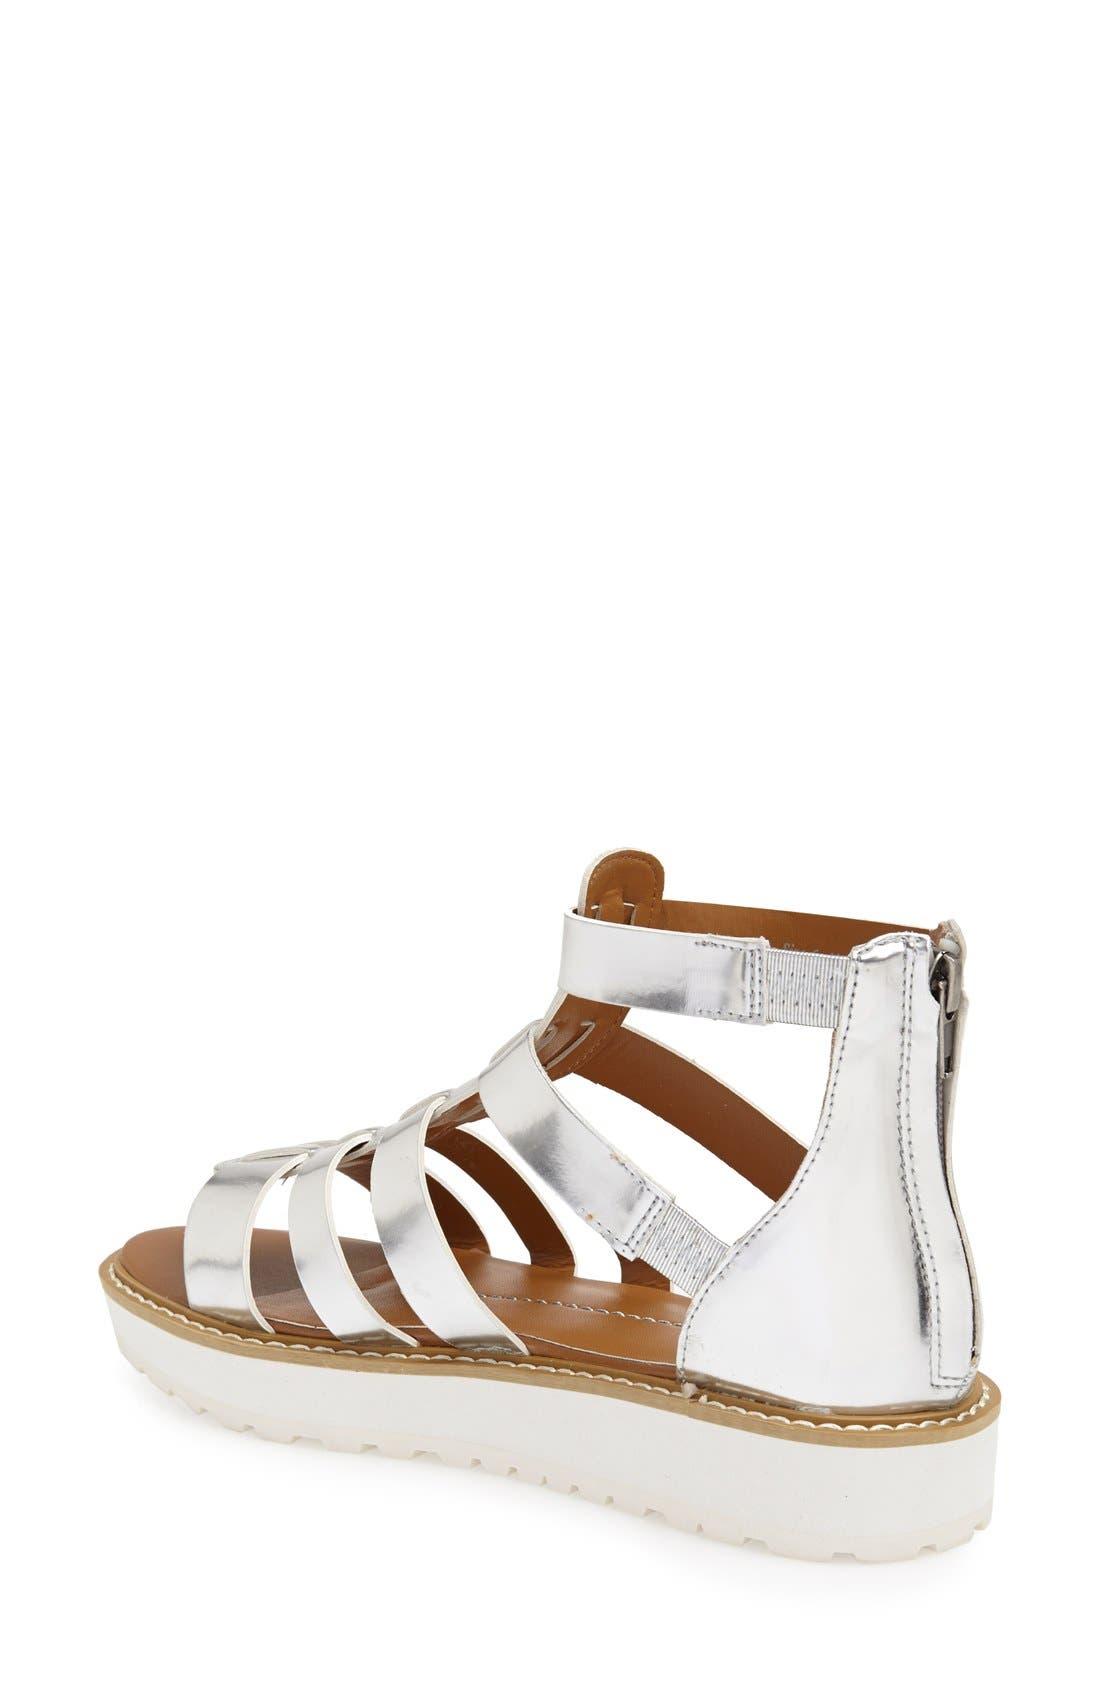 Alternate Image 2  - DV by Dolce Vita 'Zippy' Platform Sandal (Women)